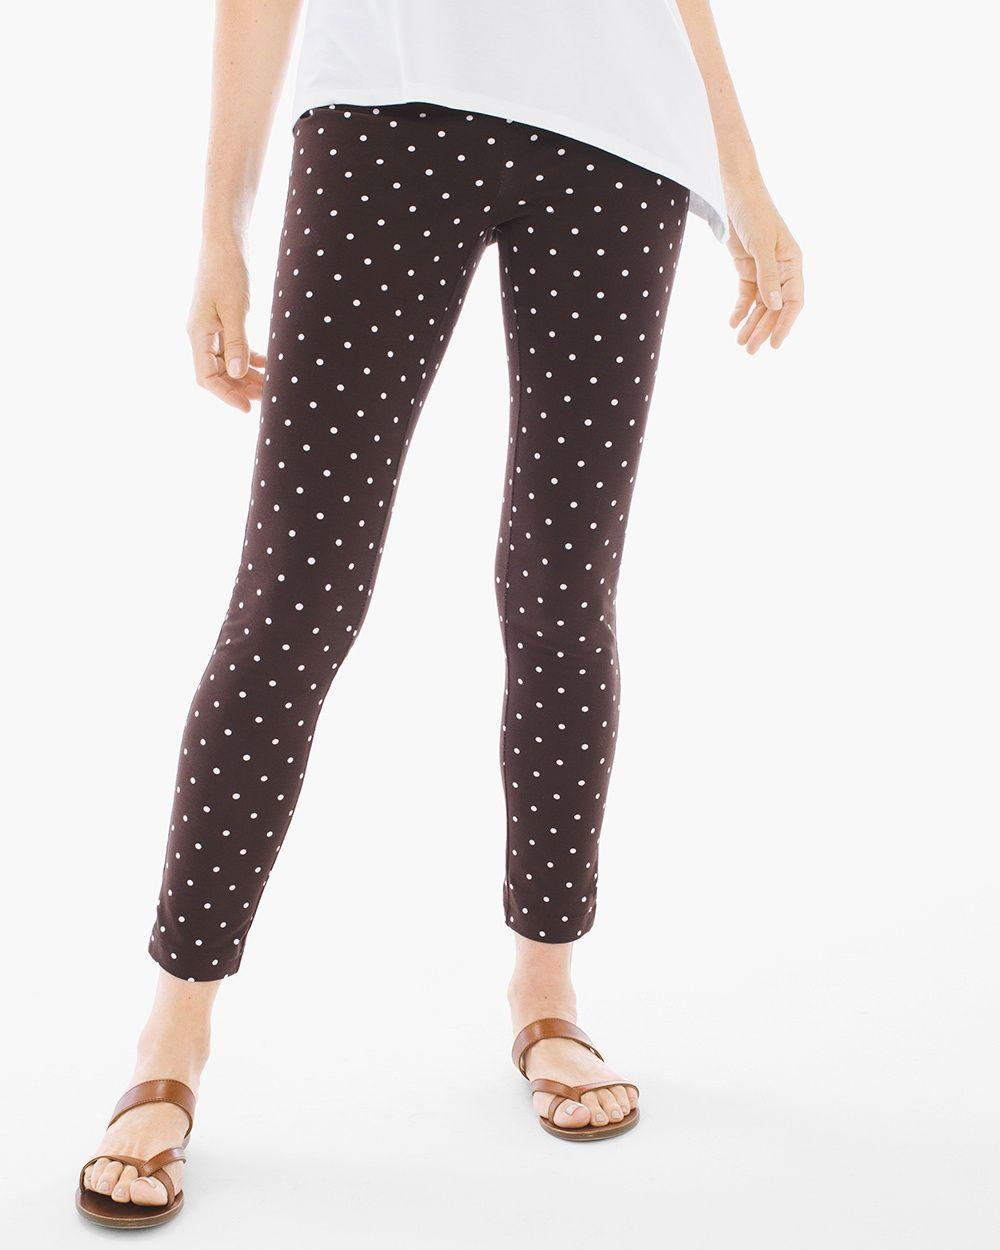 Chico's Women's Zenergy So Slimming Crop Leggings